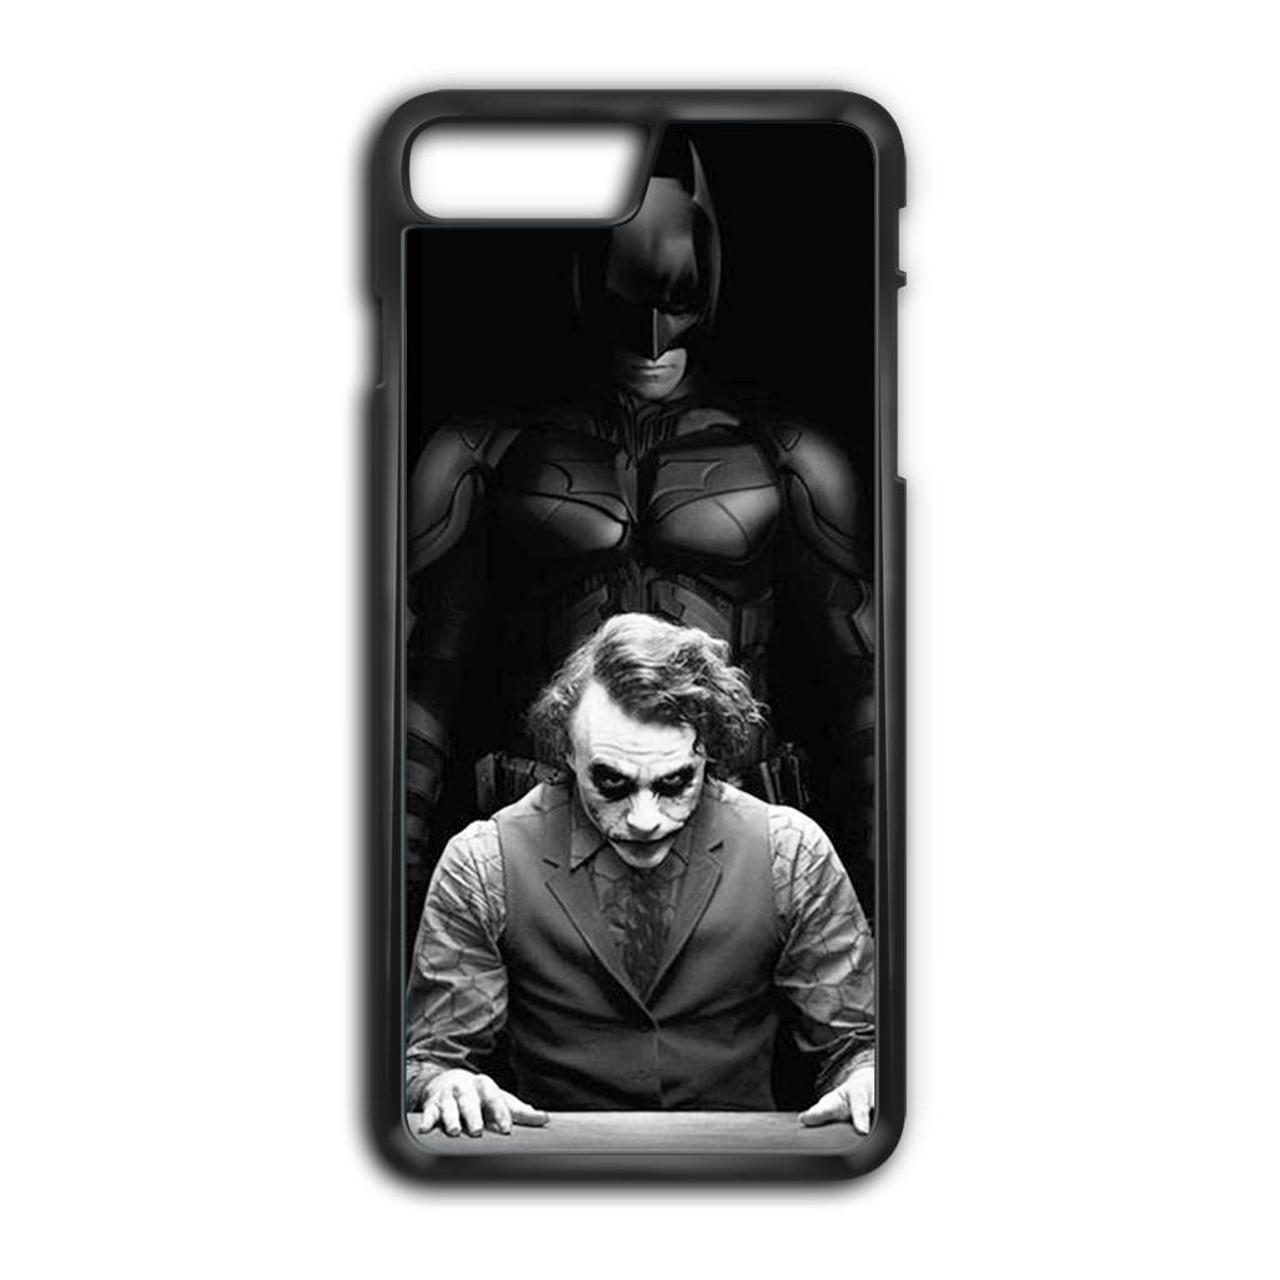 batman phone case iphone 8 plus